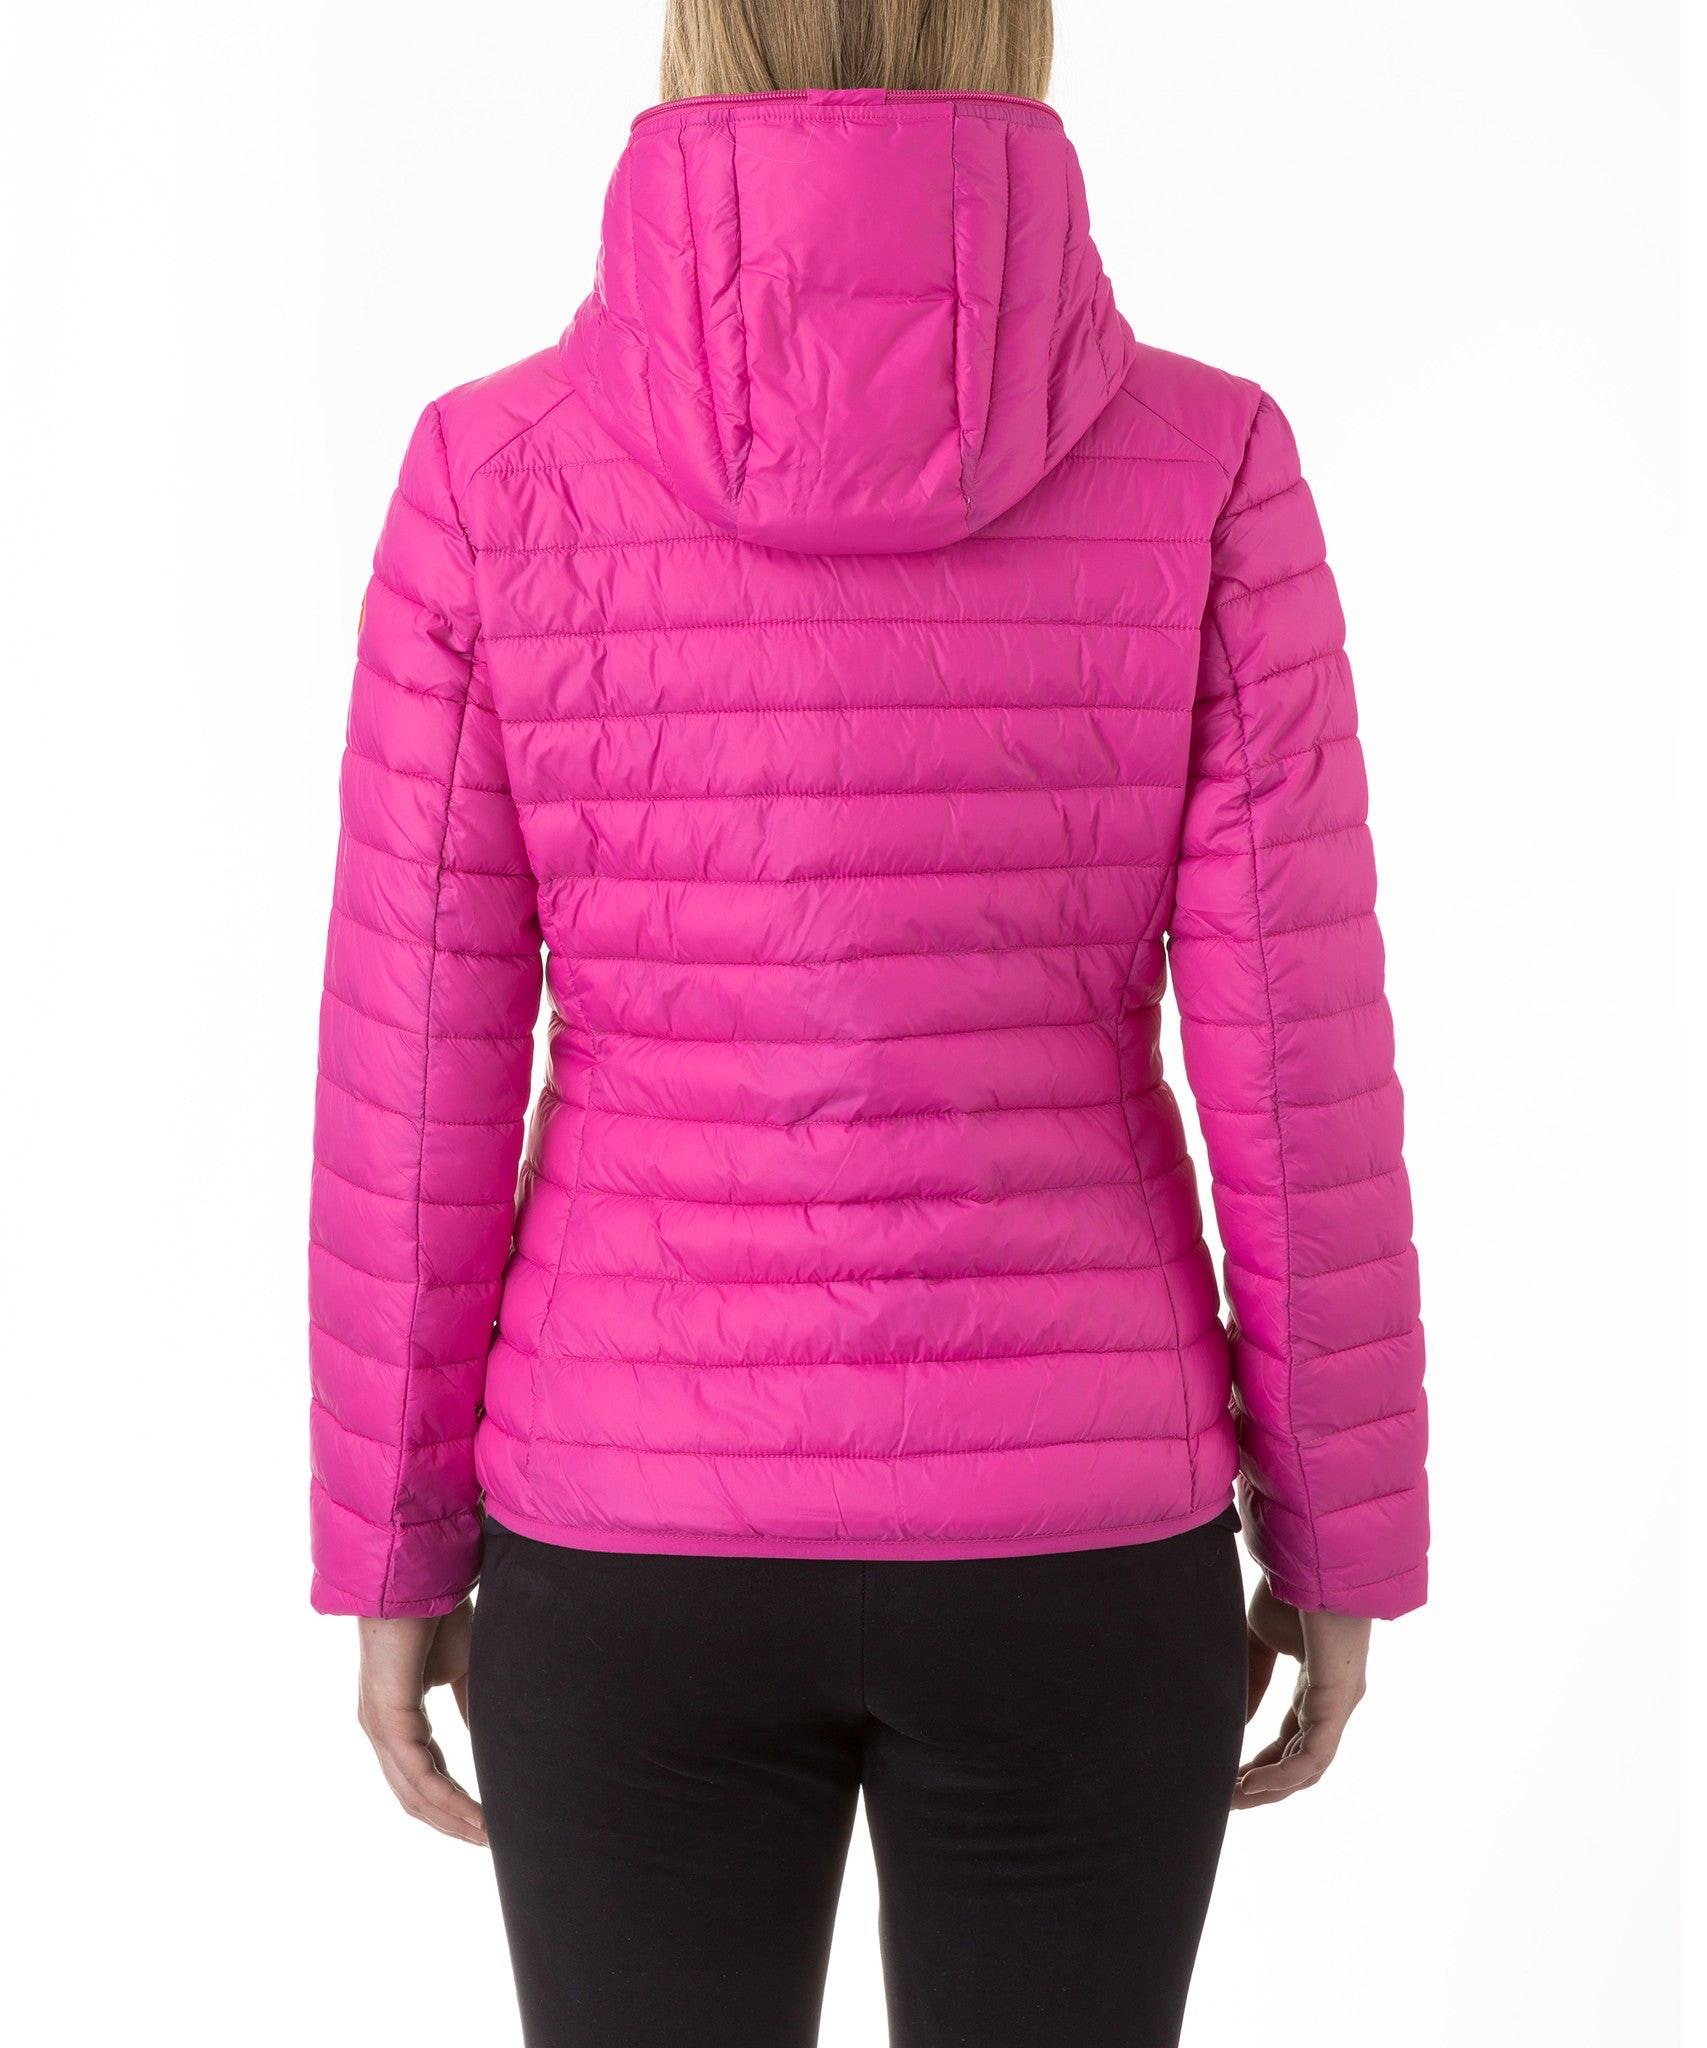 Fuchsia Pink Jacket